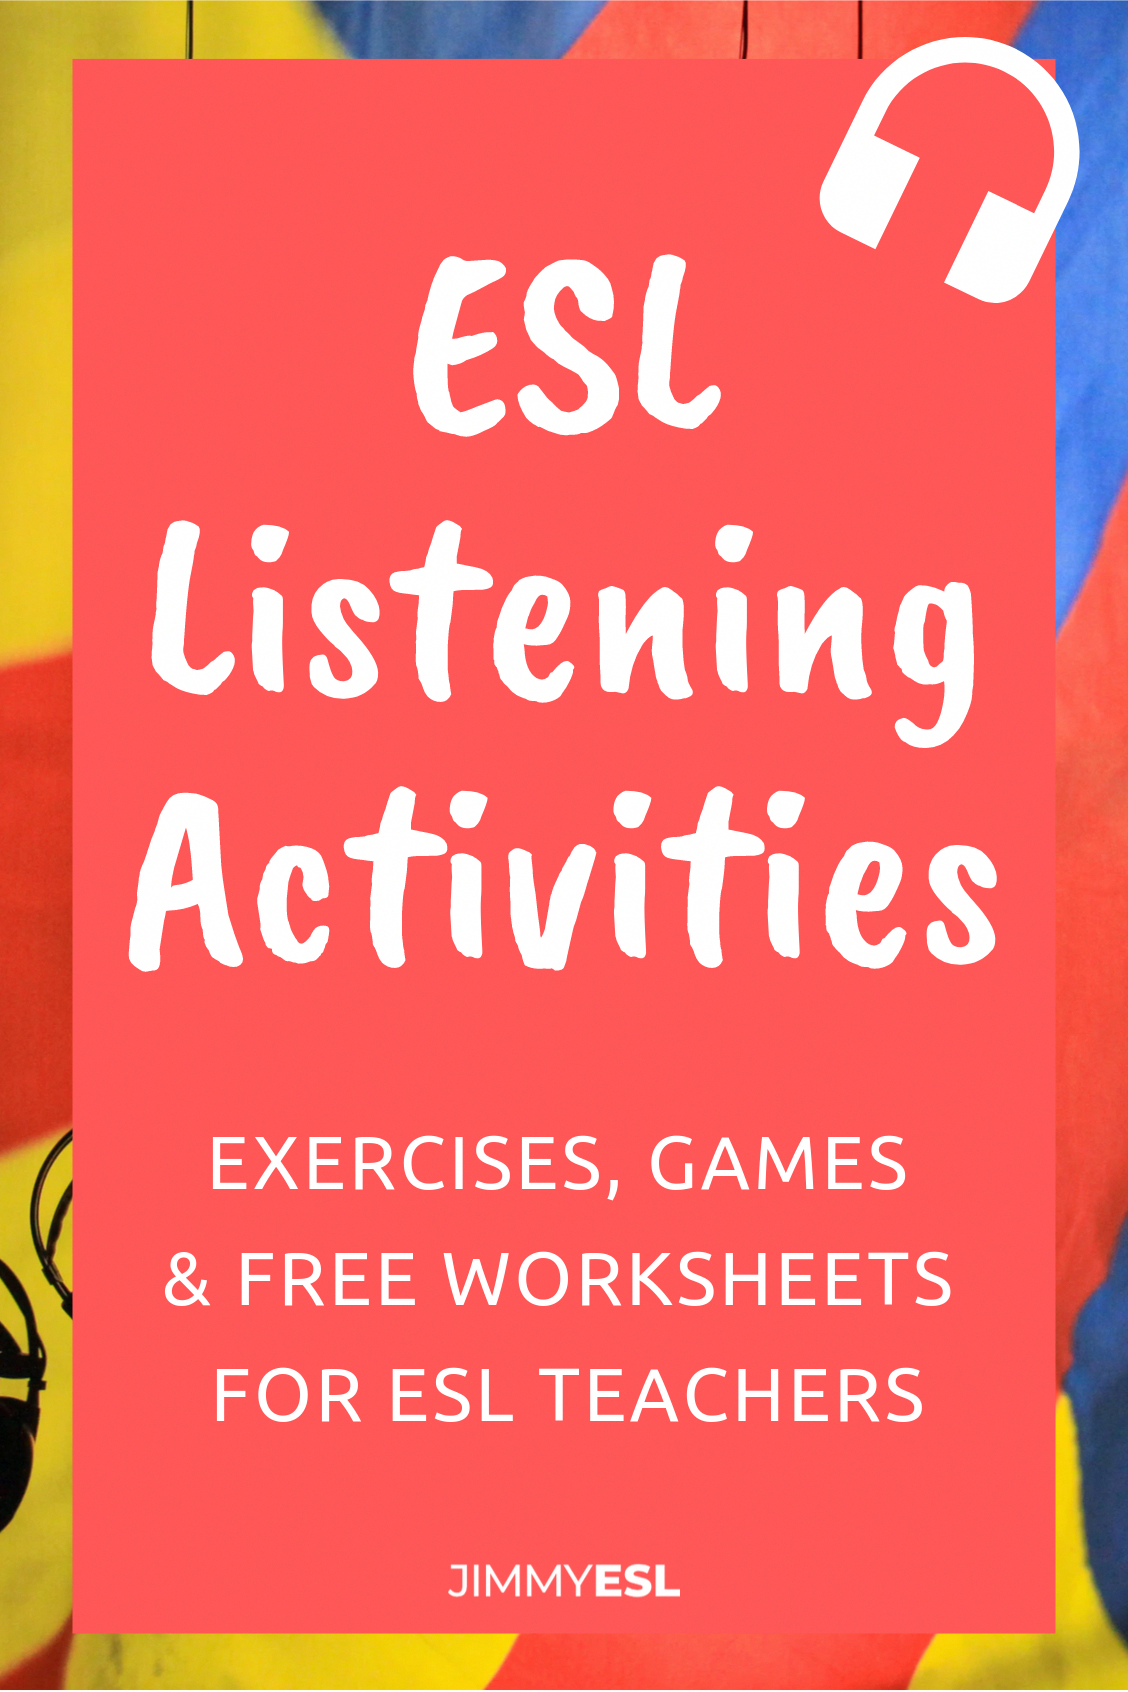 12 Great Esl Listening Activities Amp Games Plus Free